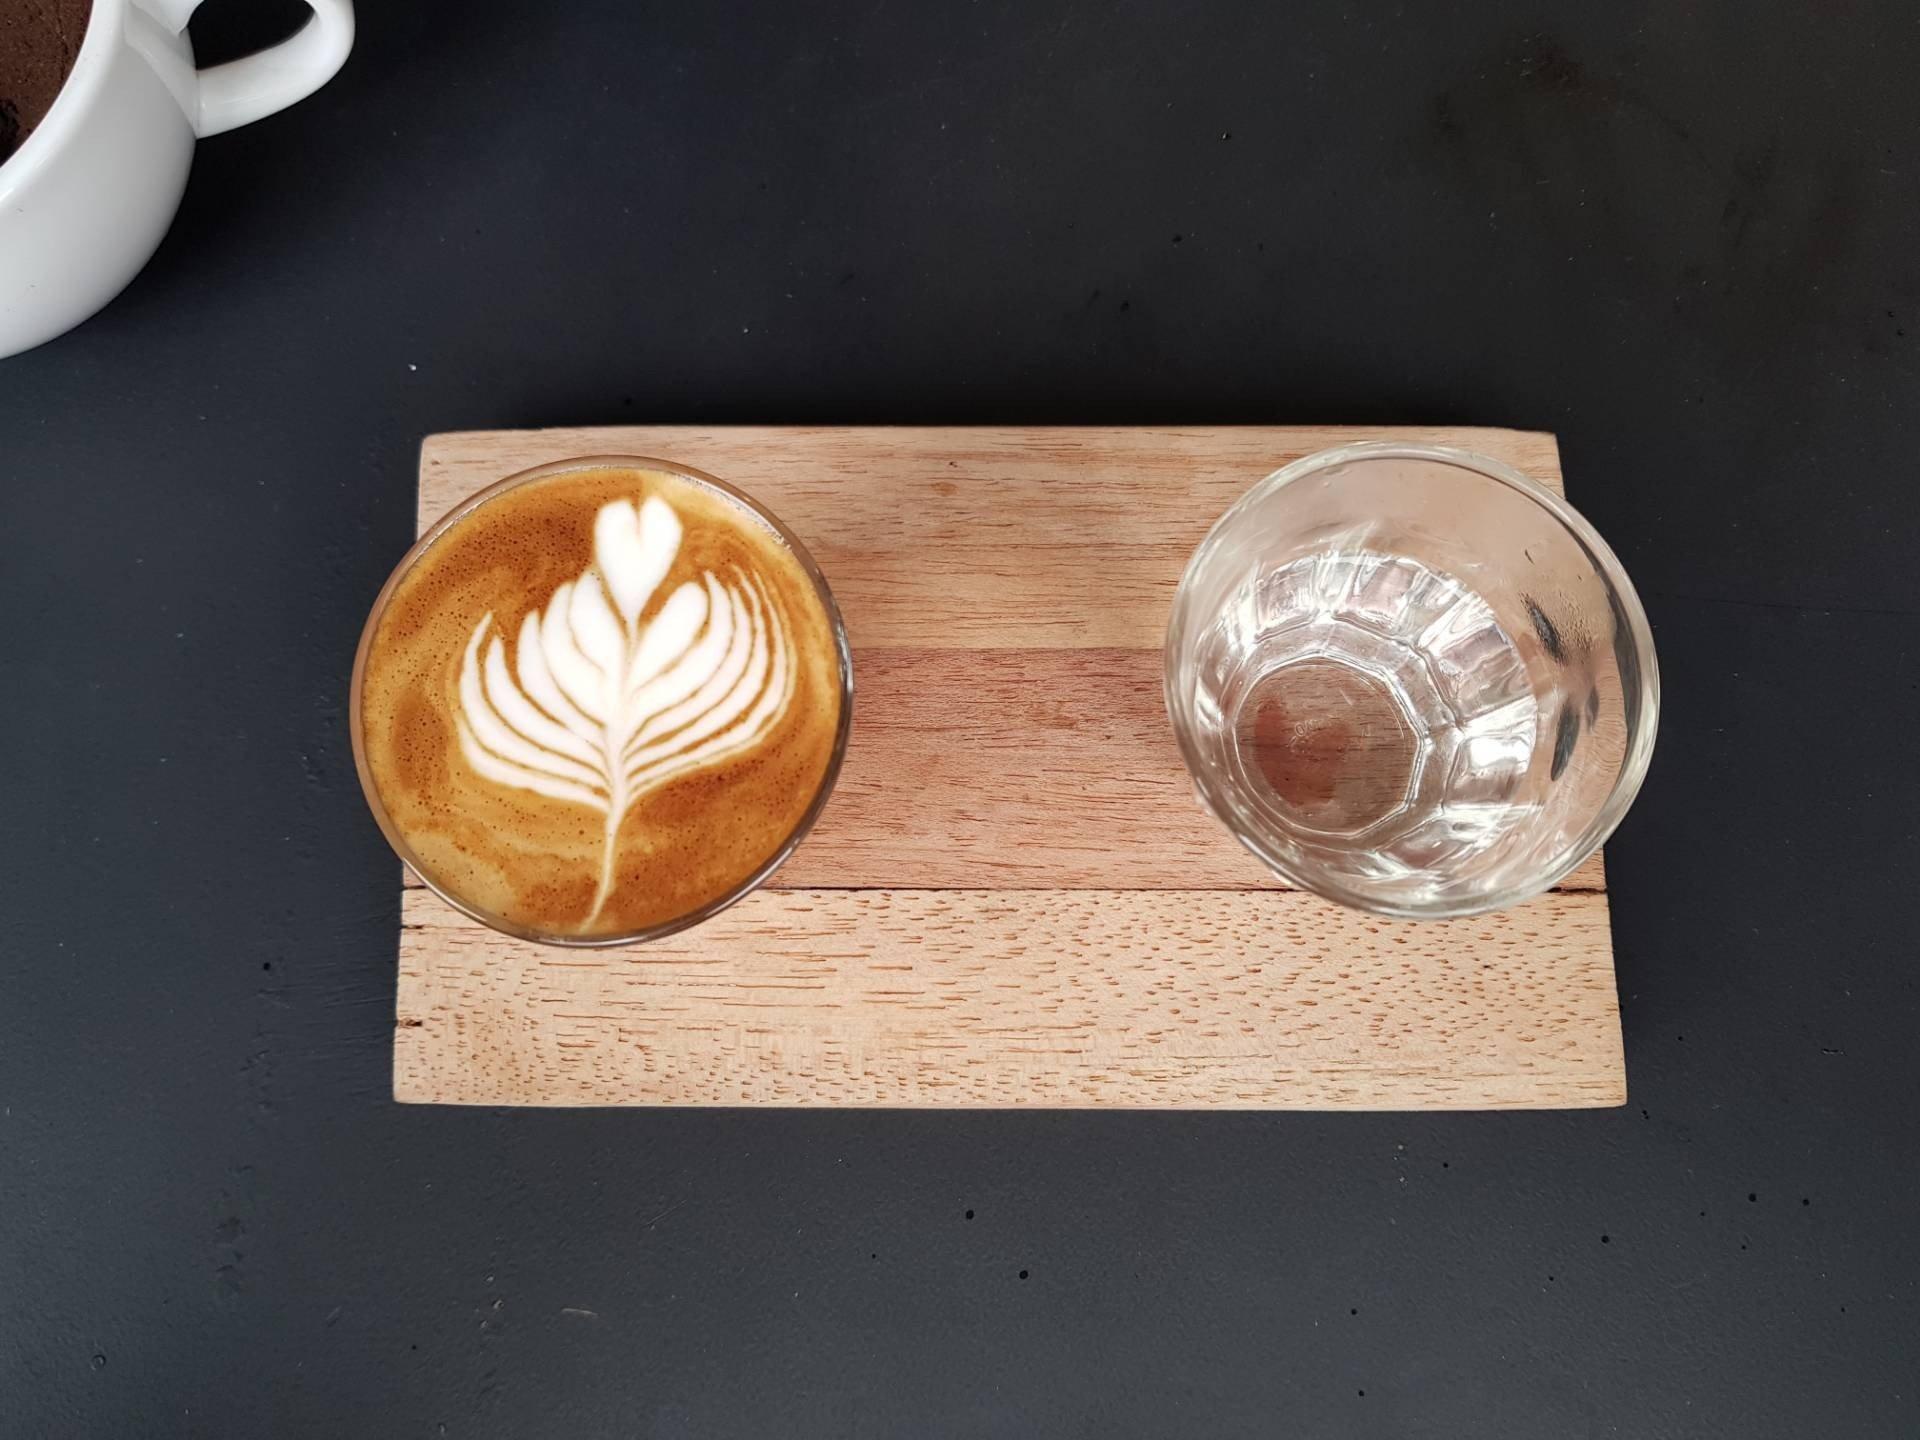 Doppio Cult Cafe & Specialty Coffee Roasters ท่าแพ